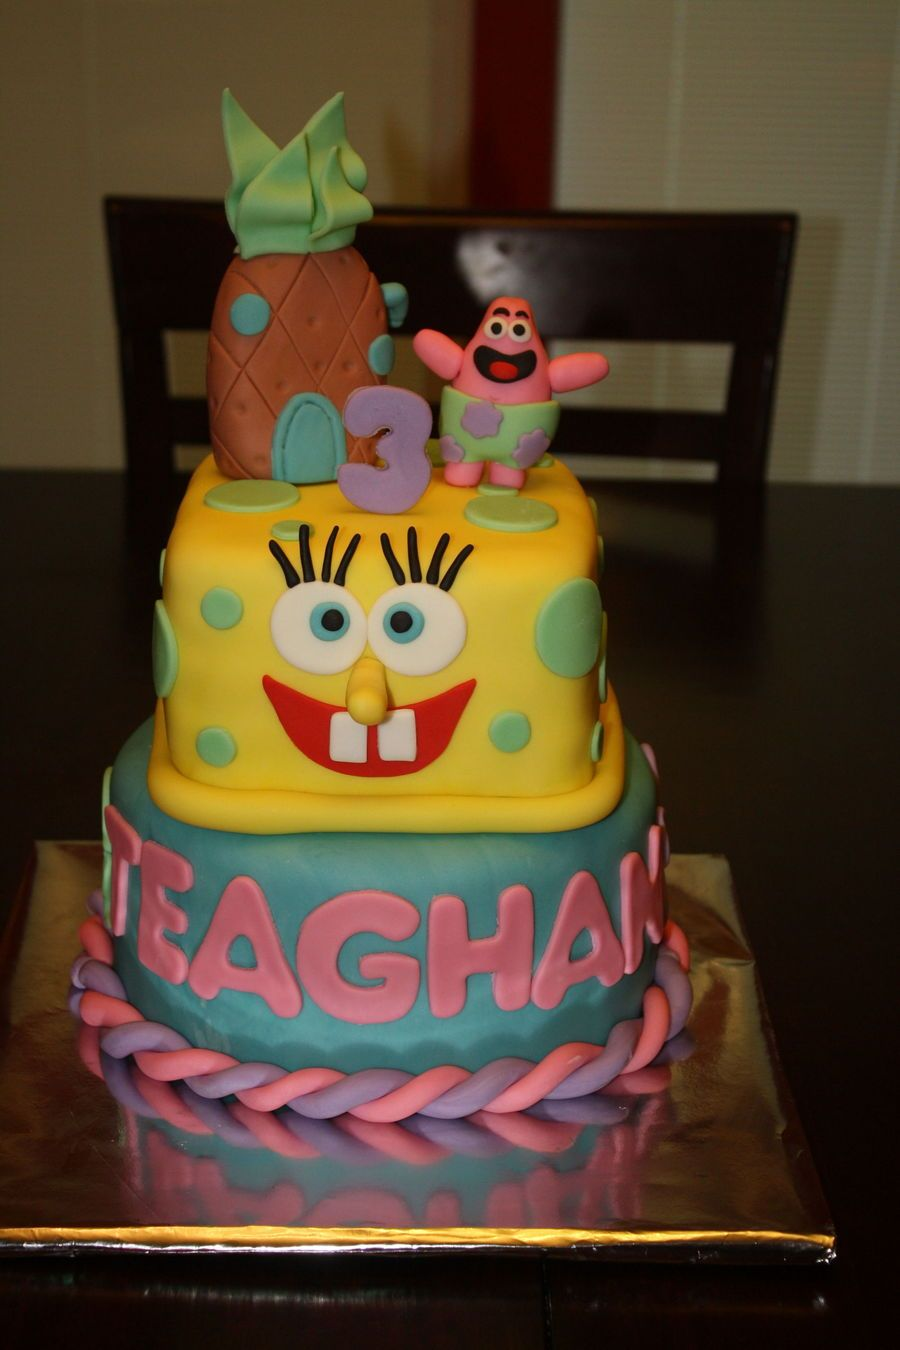 Cake ideas on pinterest pirate cakes marshmallow fondant and - Spongebob Squarepants Girl Cake All Marshmallow Fondant Bottom Tier Chocolate Cake With Buttercream Filling Top Tier